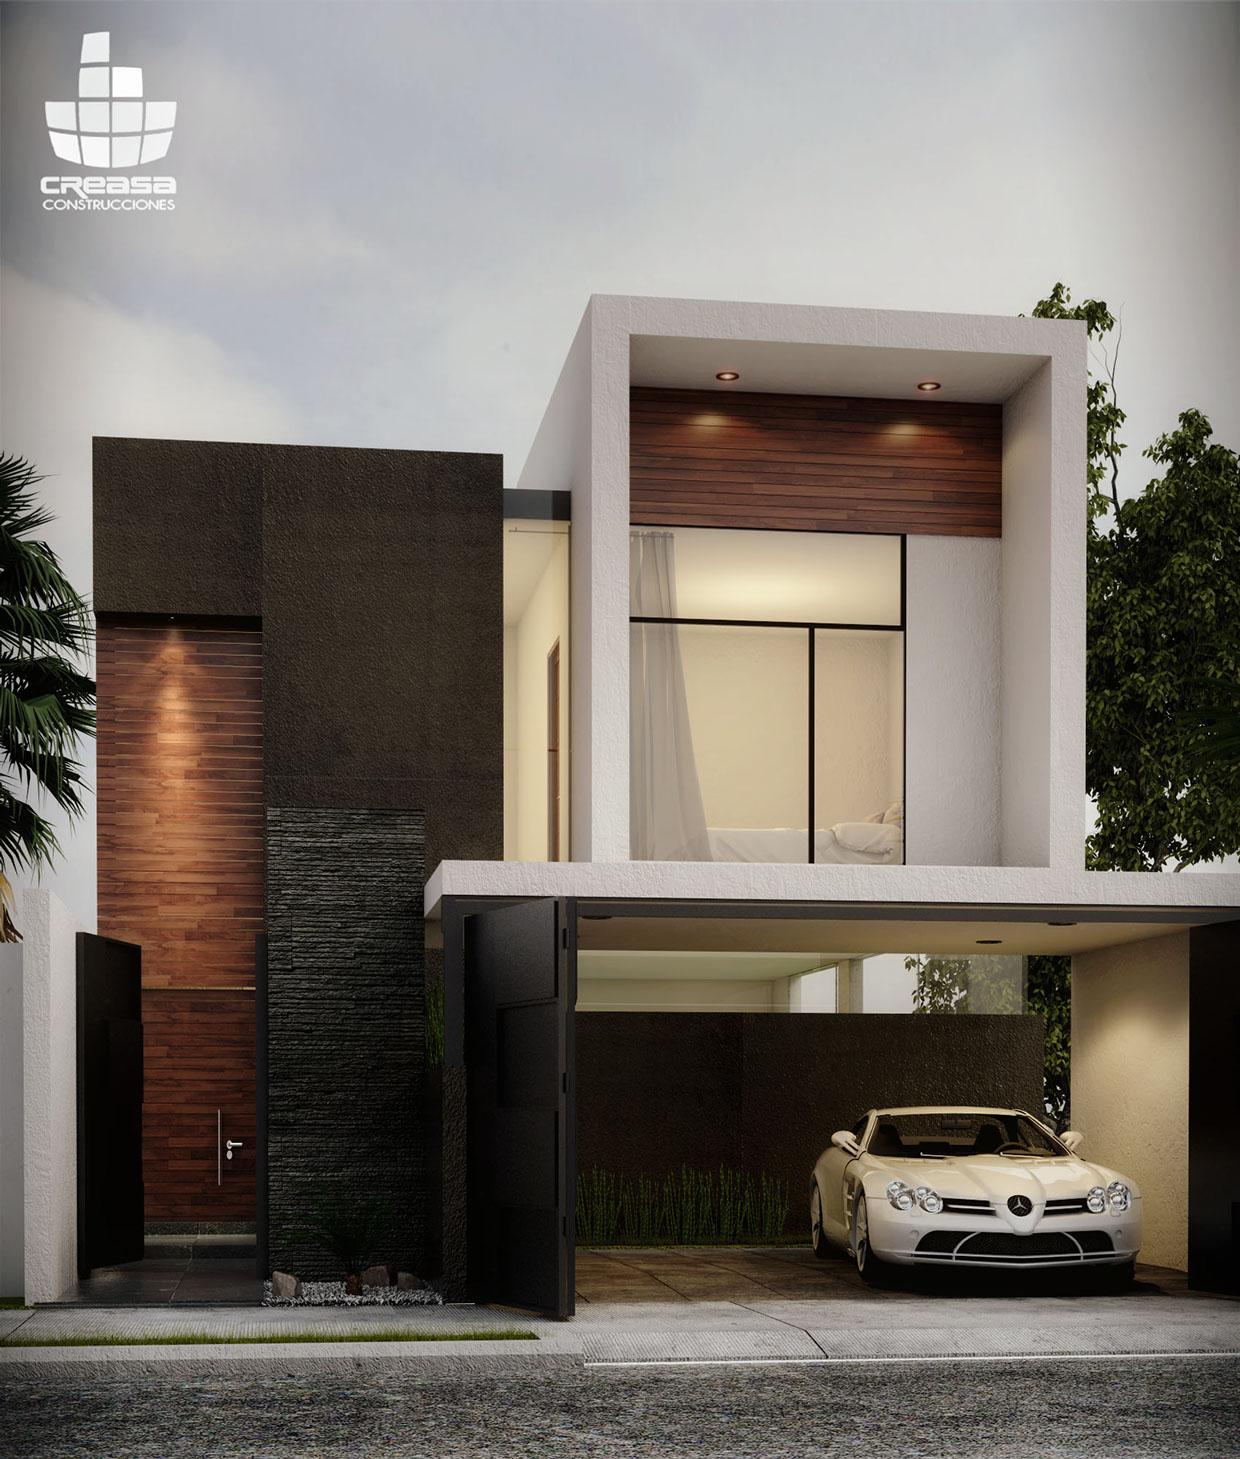 Top 10 houses of this week 18 07 2015 architecture for Construcciones de casas modernas